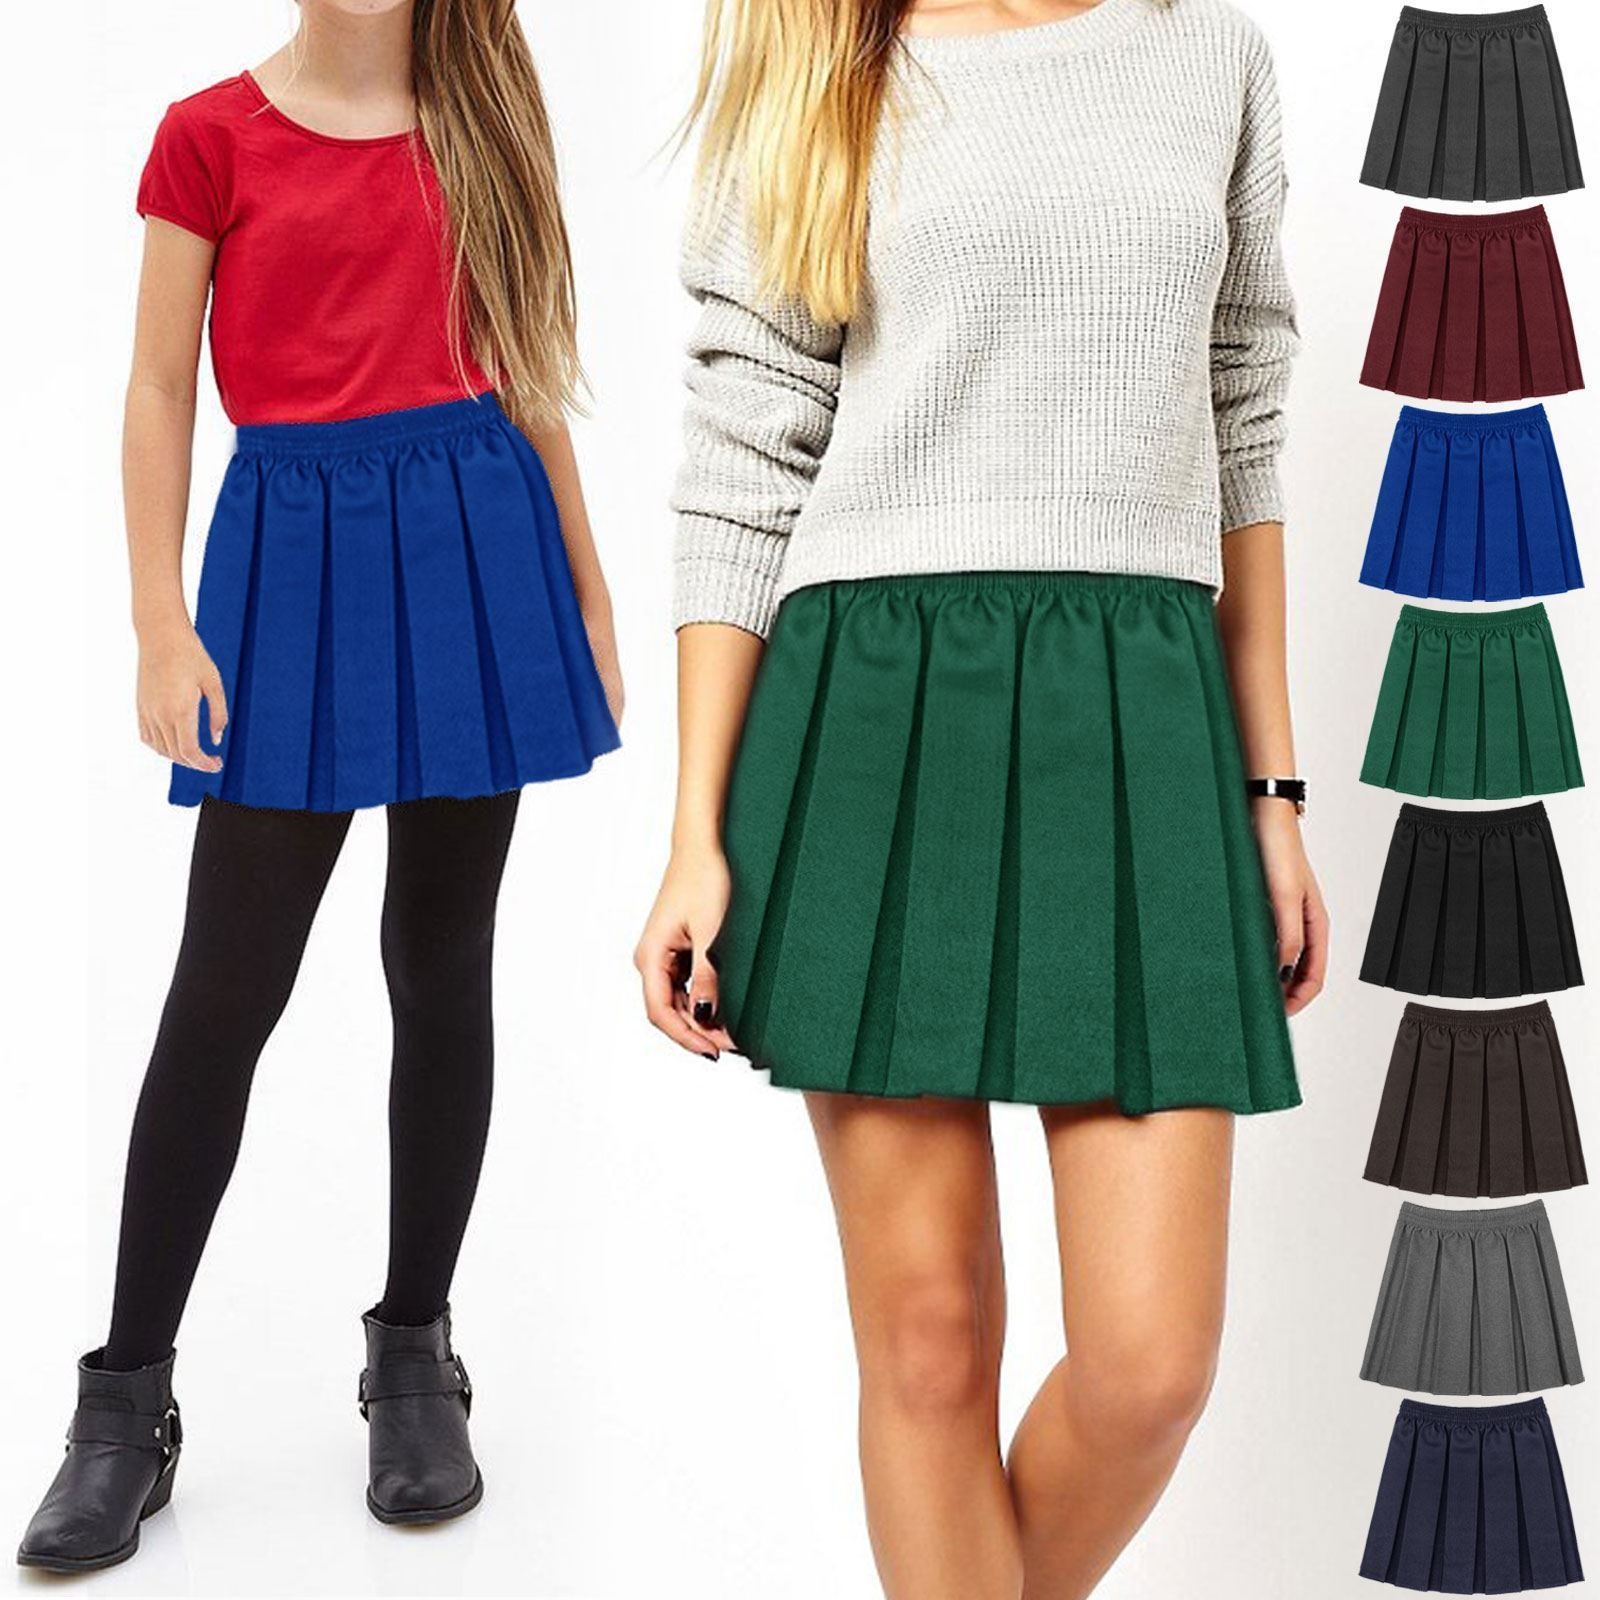 131d47be7750 China Girls Primary School Uniform Dress Pleated Skirt - China Skirt,  Uniform School Skirt